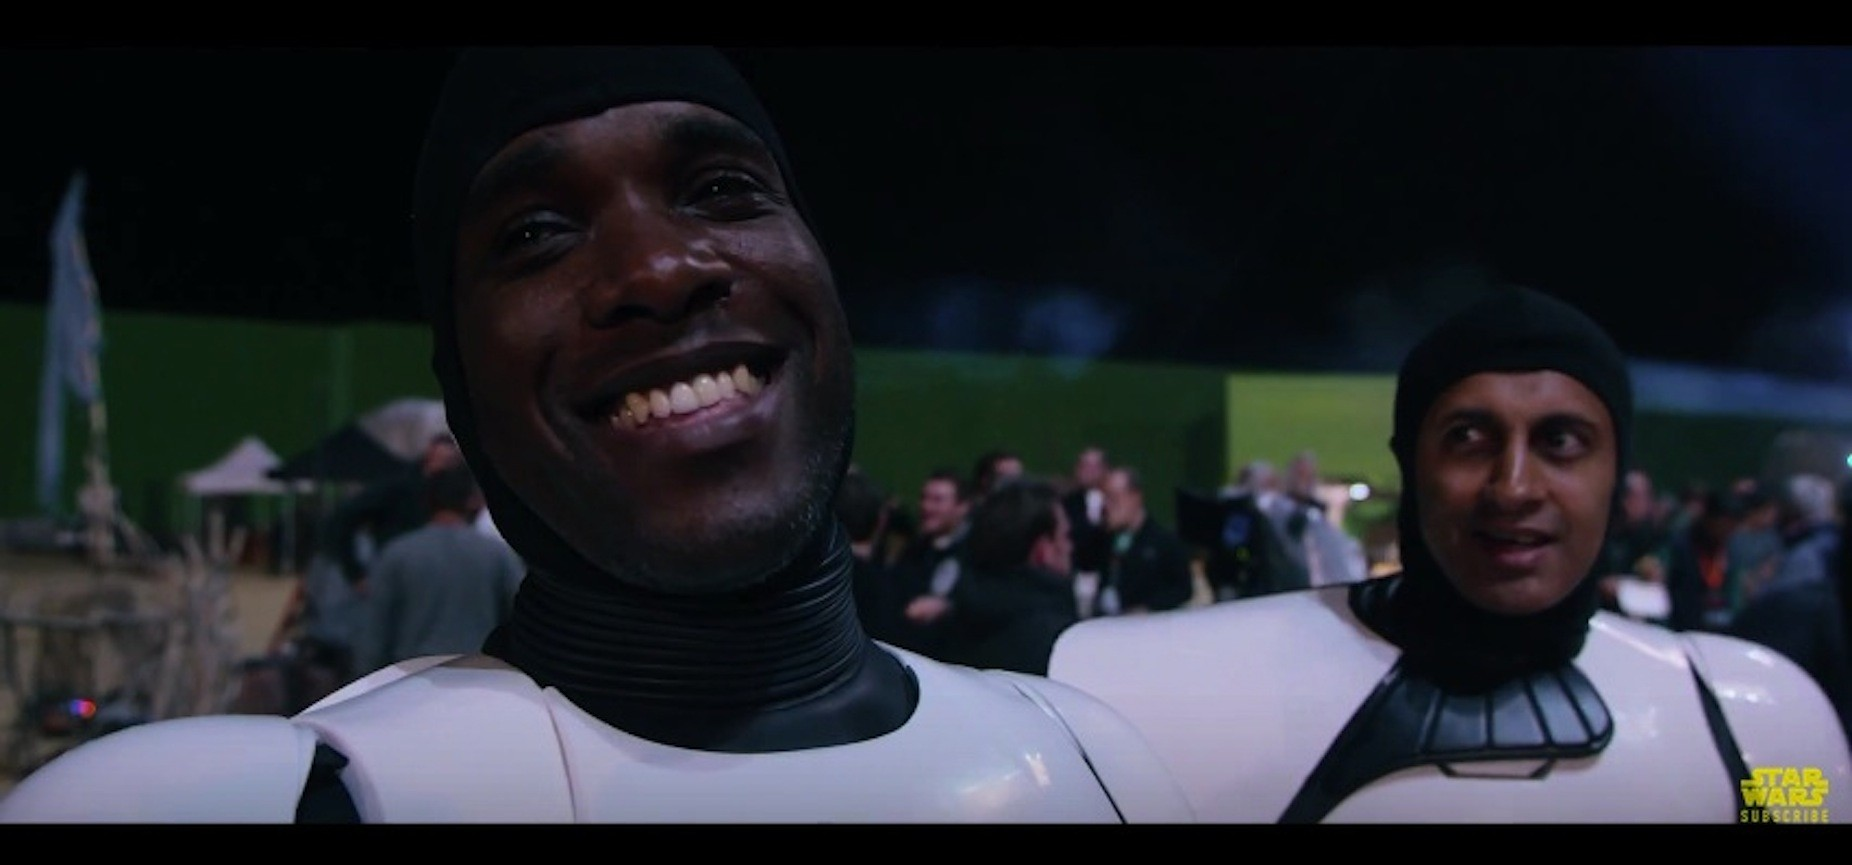 Phoenix James - Star Wars - The Force Awakens - Stormtrooper - Behind the Scenes - Comic-Con 2015 Reel